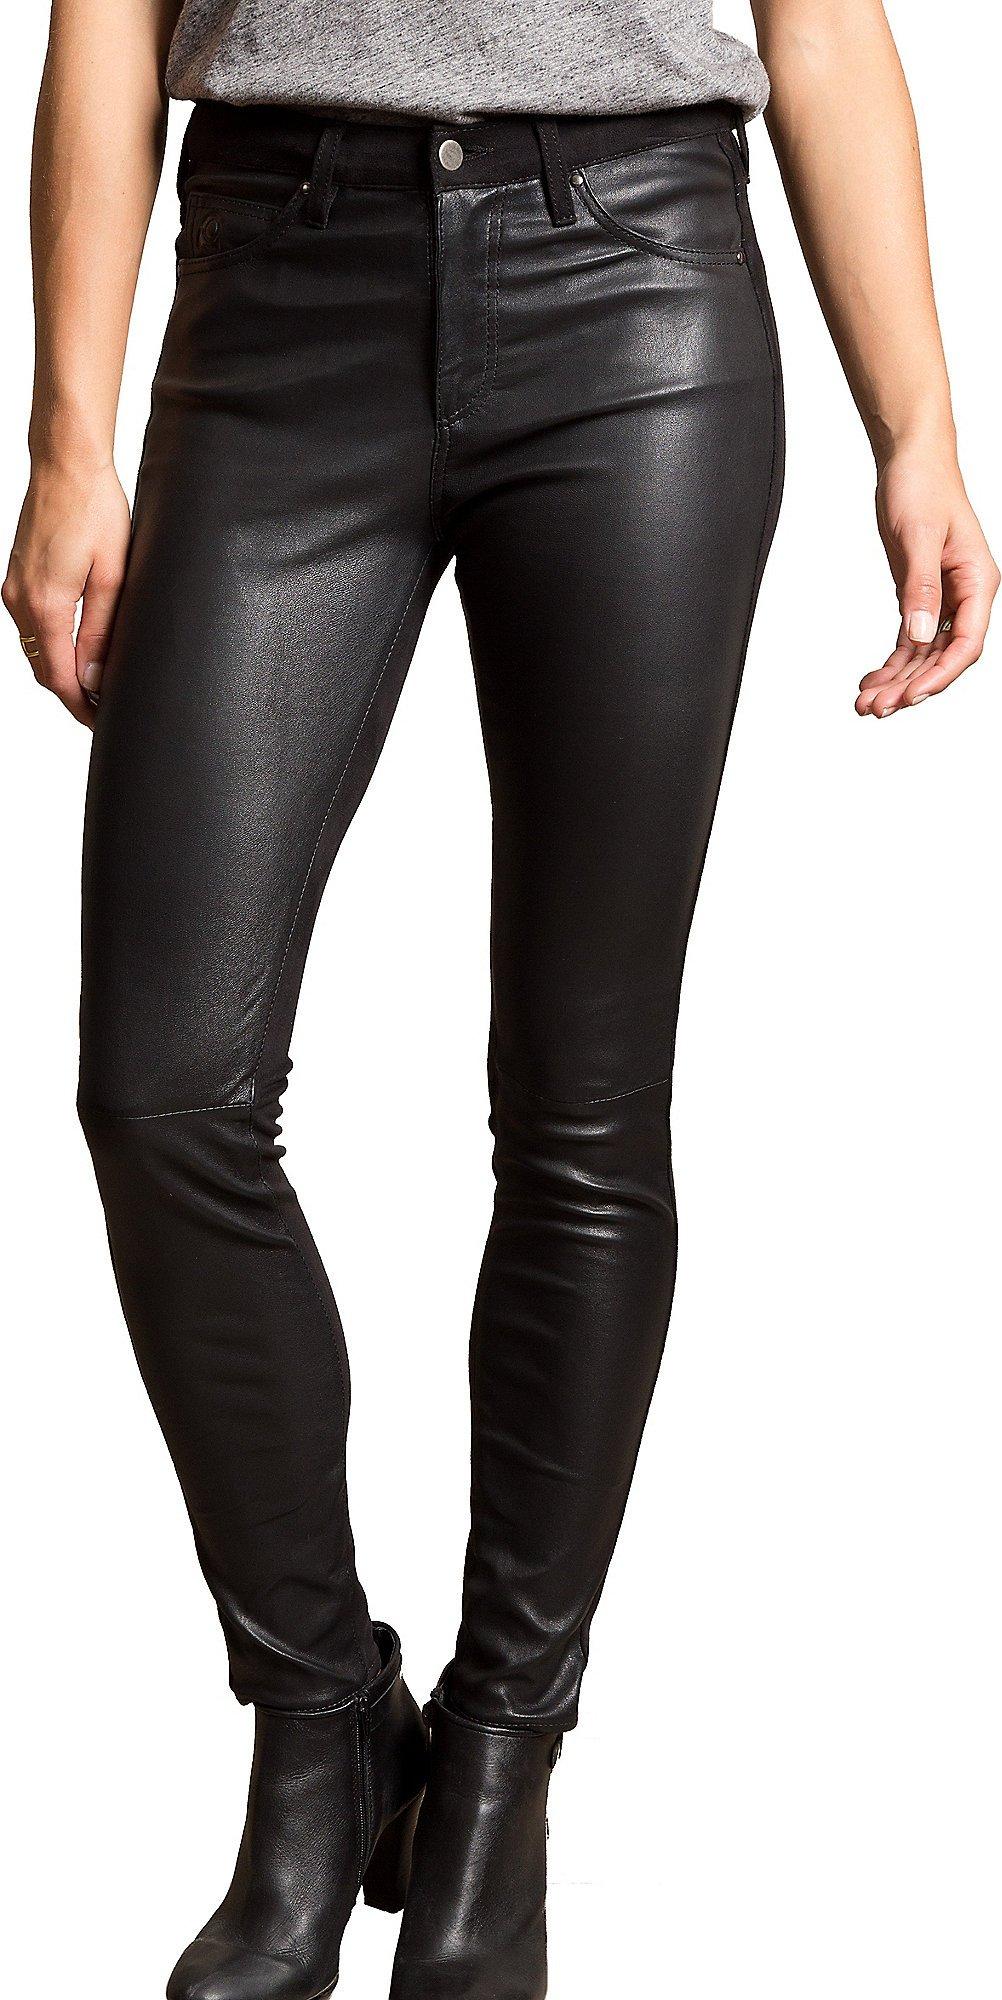 Overland Sheepskin Co Leather Stretch Leggings